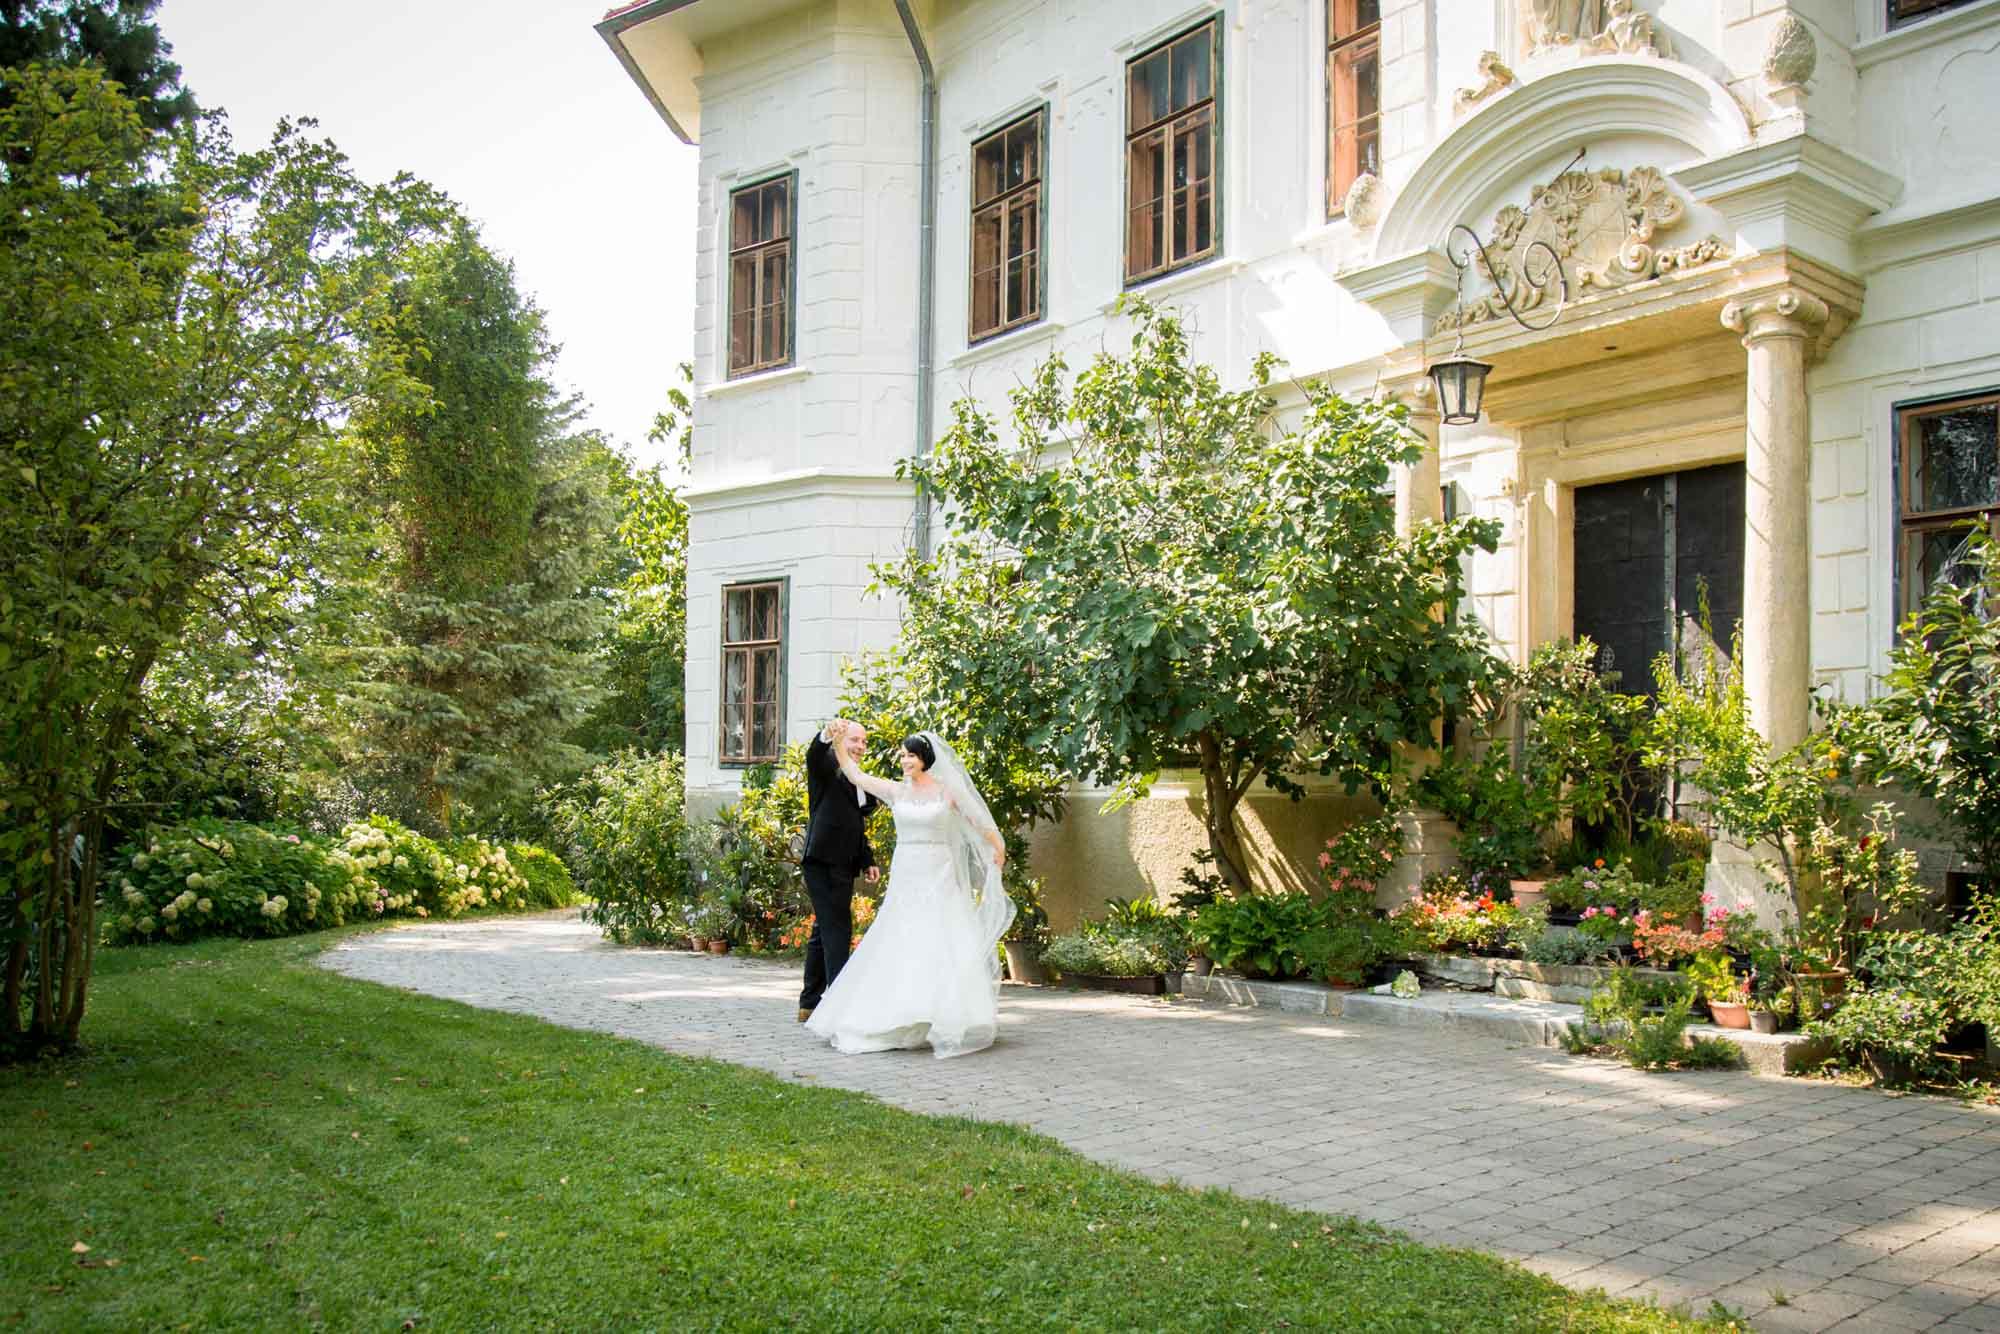 Bohemian Photography | Hochzeitsfotografie